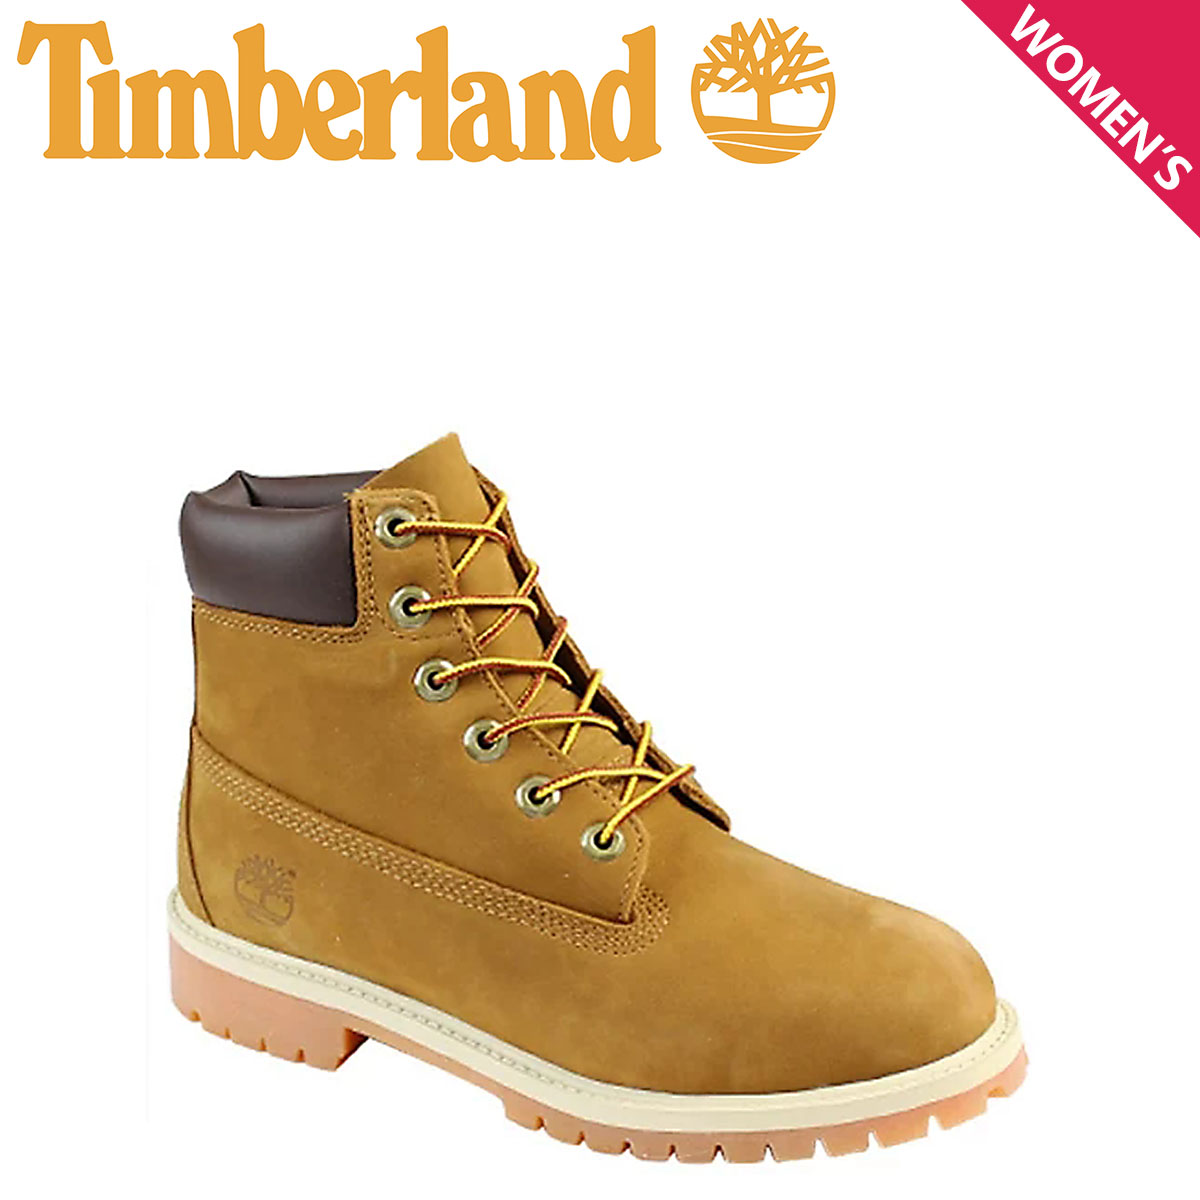 Timberland ティンバーランド 6INCH 6インチ プレミアム ブーツ レディース JUNIOR 6-INCH PREMIUM BOOT 14949 防水